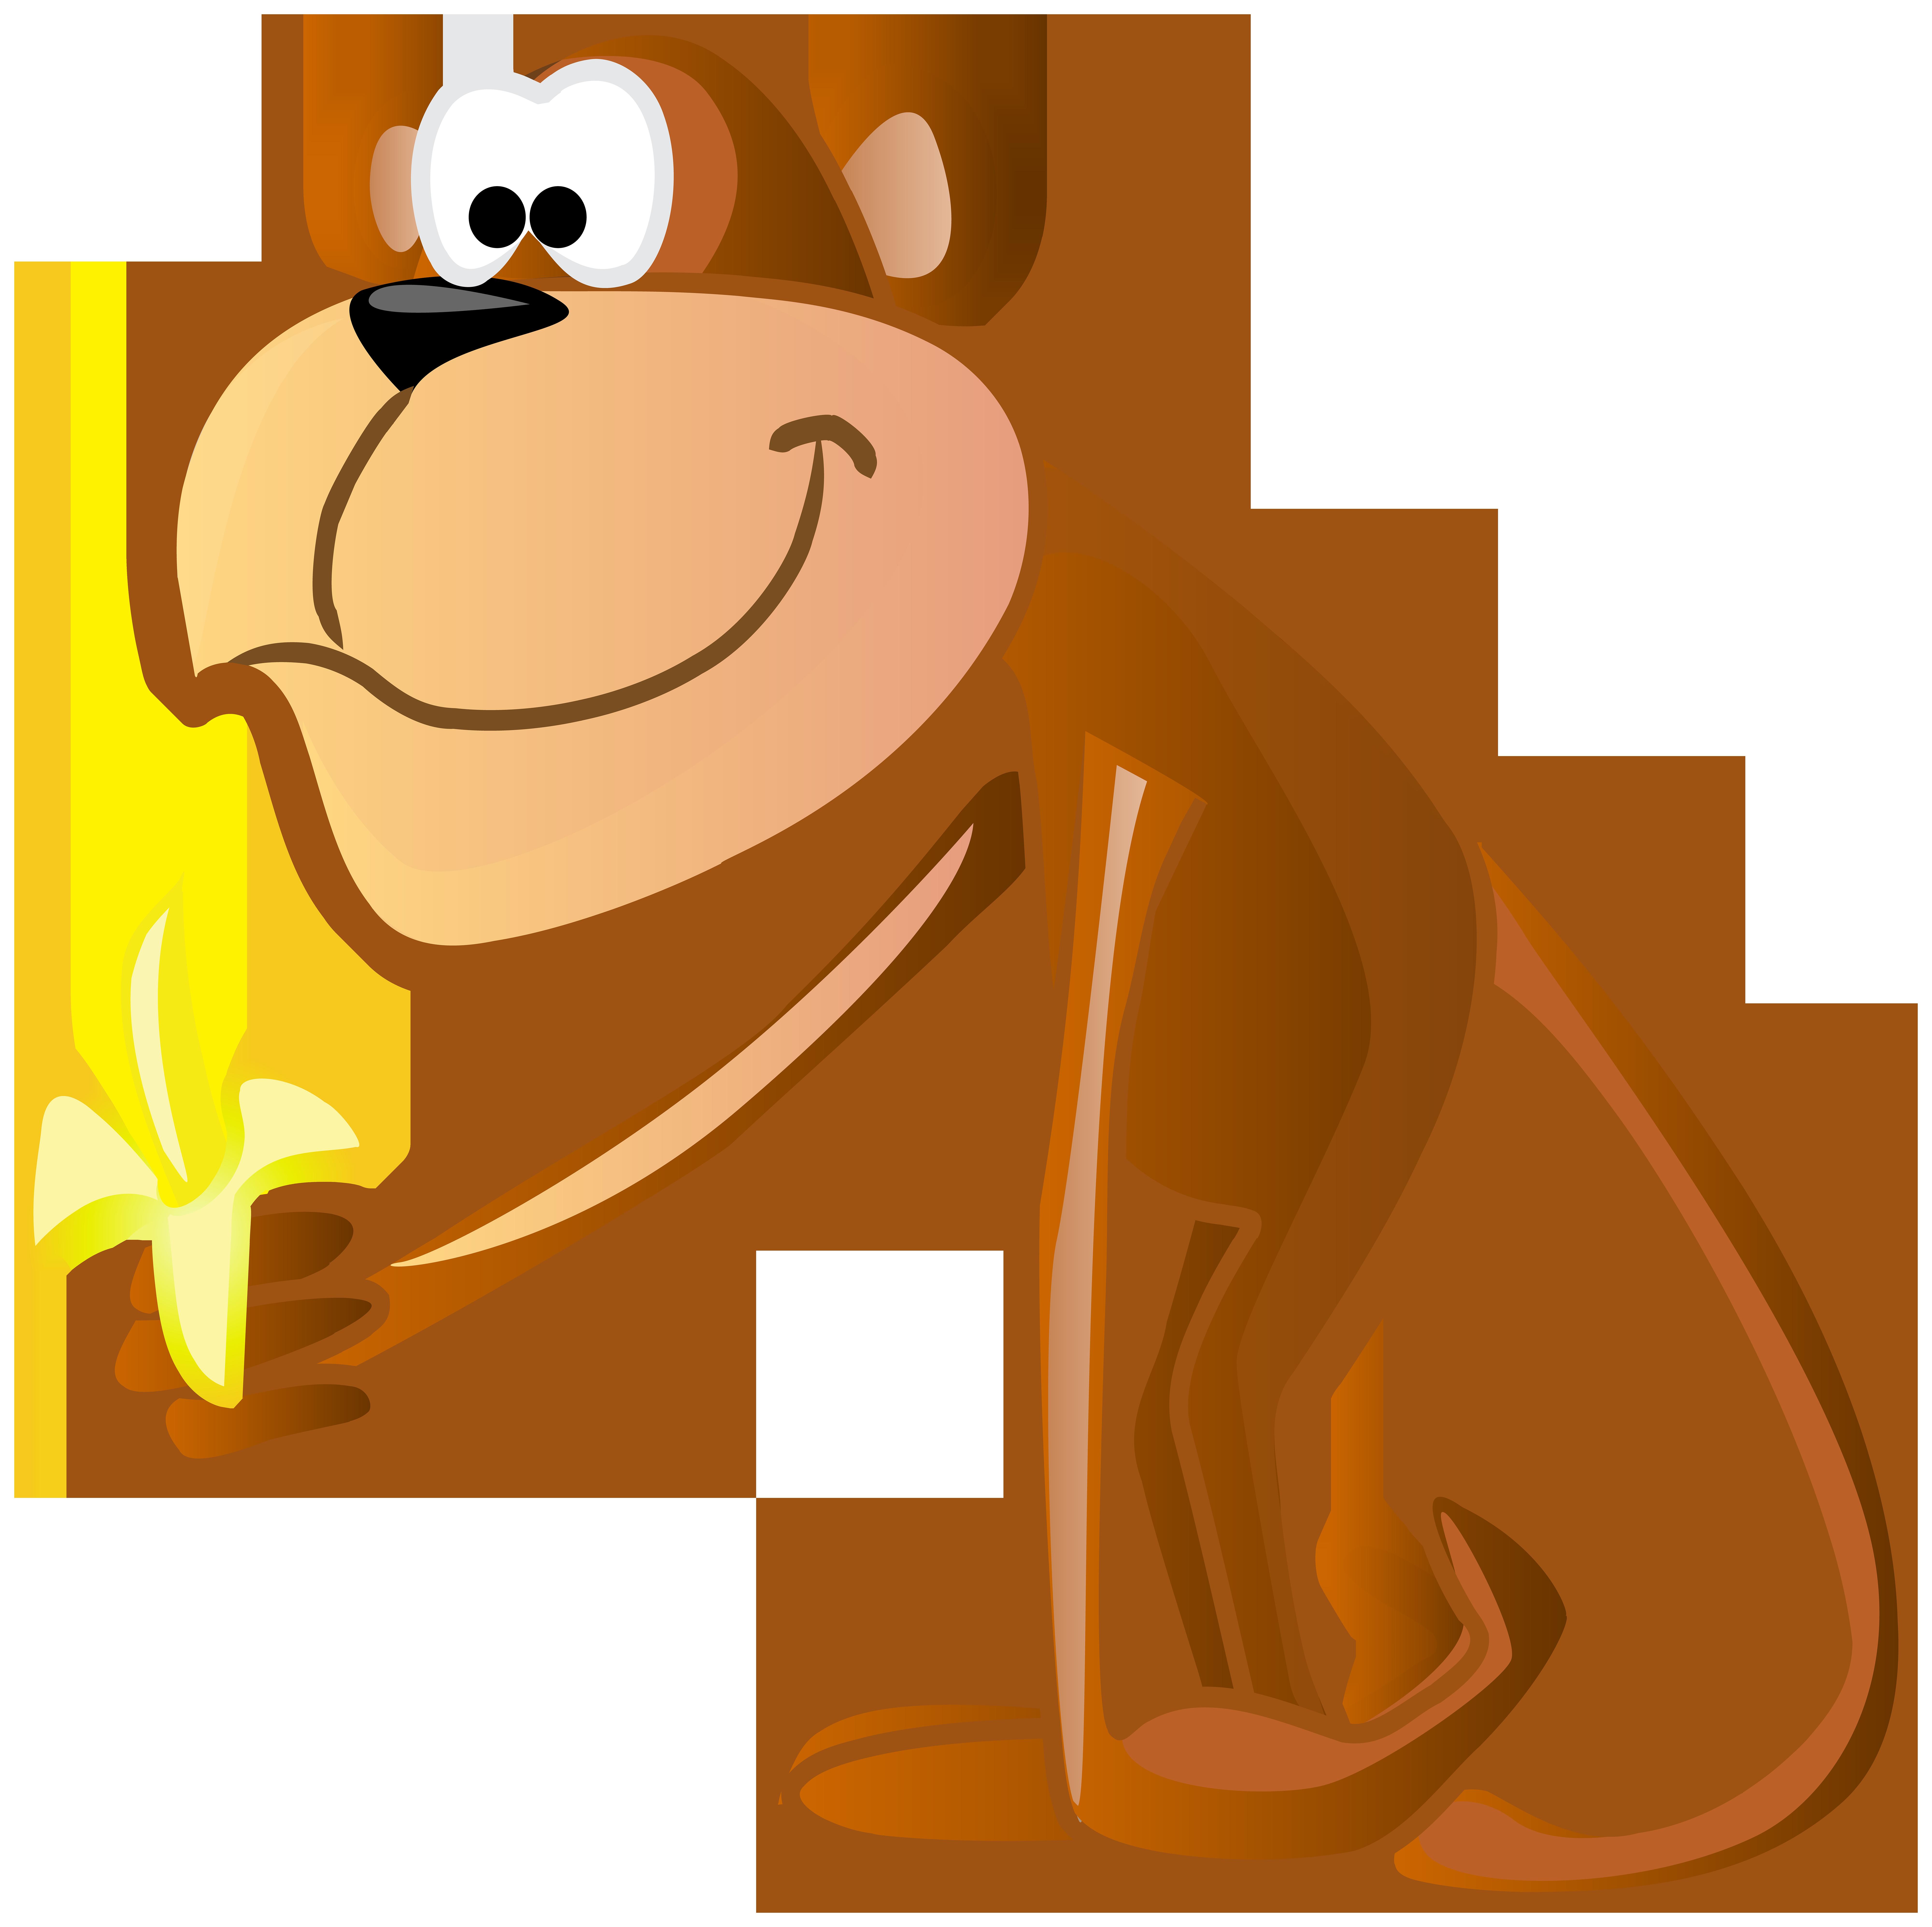 8000x7980 Monkey Cartoon Clip Art Imageu200b Gallery Yopriceville